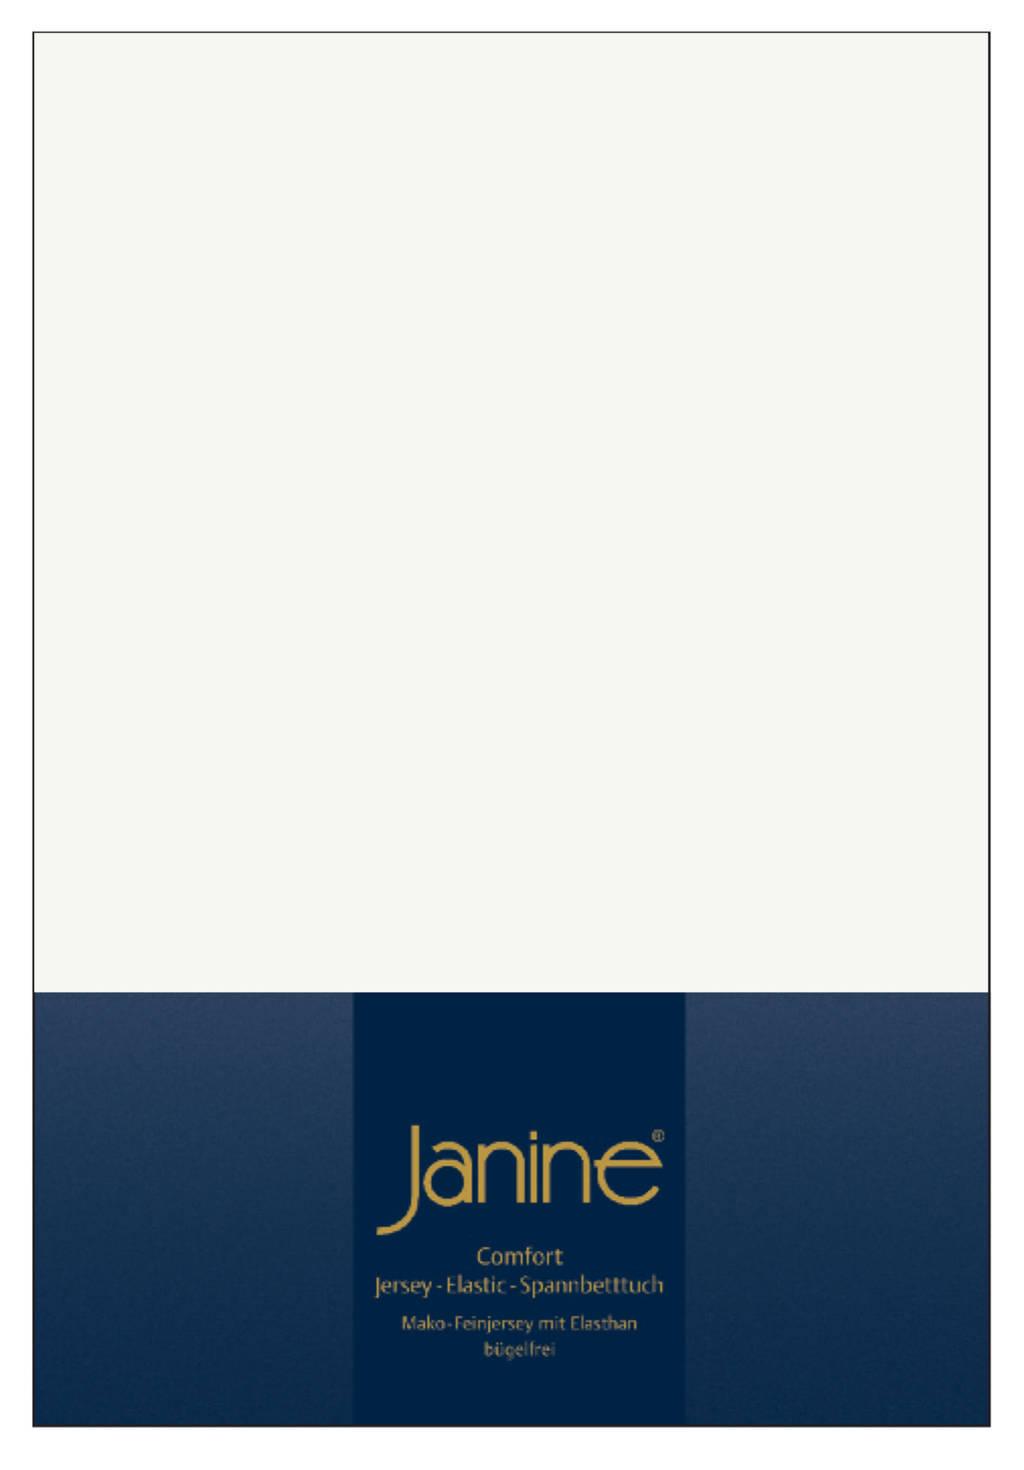 На резинке Простыня на резинке 70x90-140 Janine Elastic-Jersey 5002 экрю elitnaya-prostynya-natyazhnaya-na-rezinke-elastic-jersey-ecru-ot-janine-germaniya.jpg